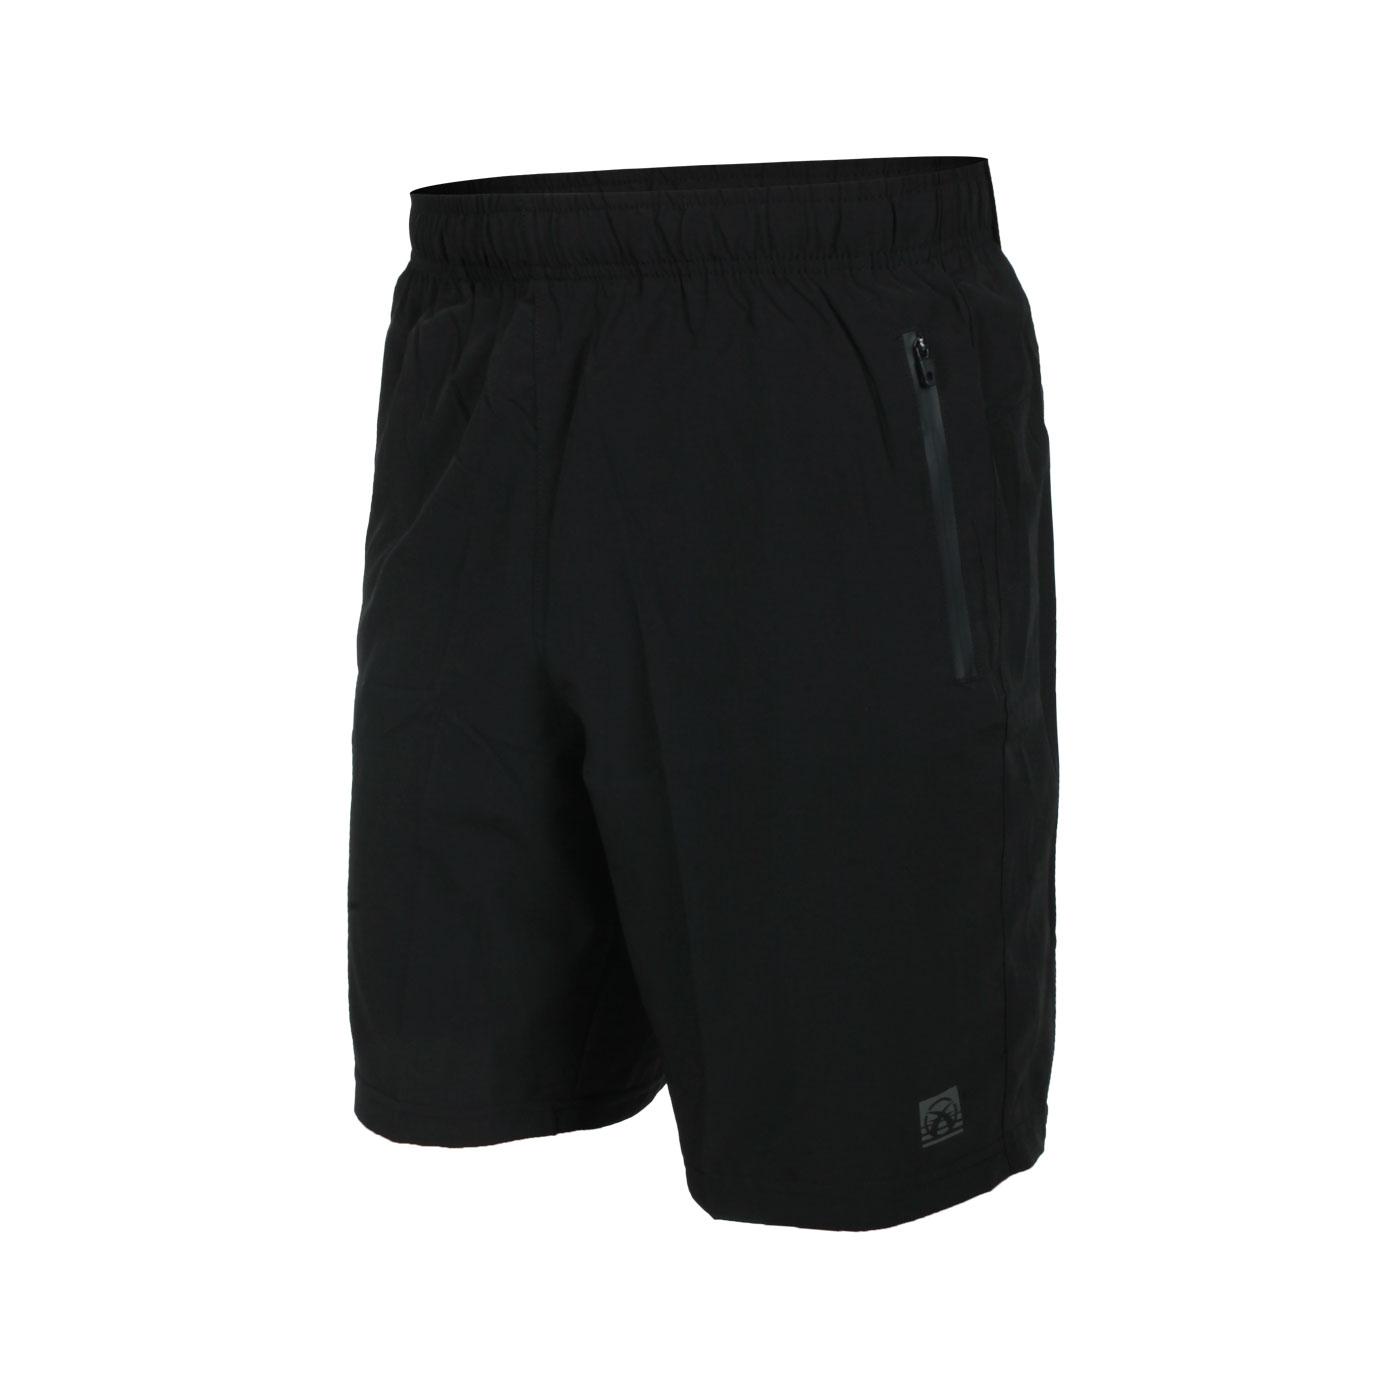 FIRESTAR 男款彈性平織短褲 C1718-10